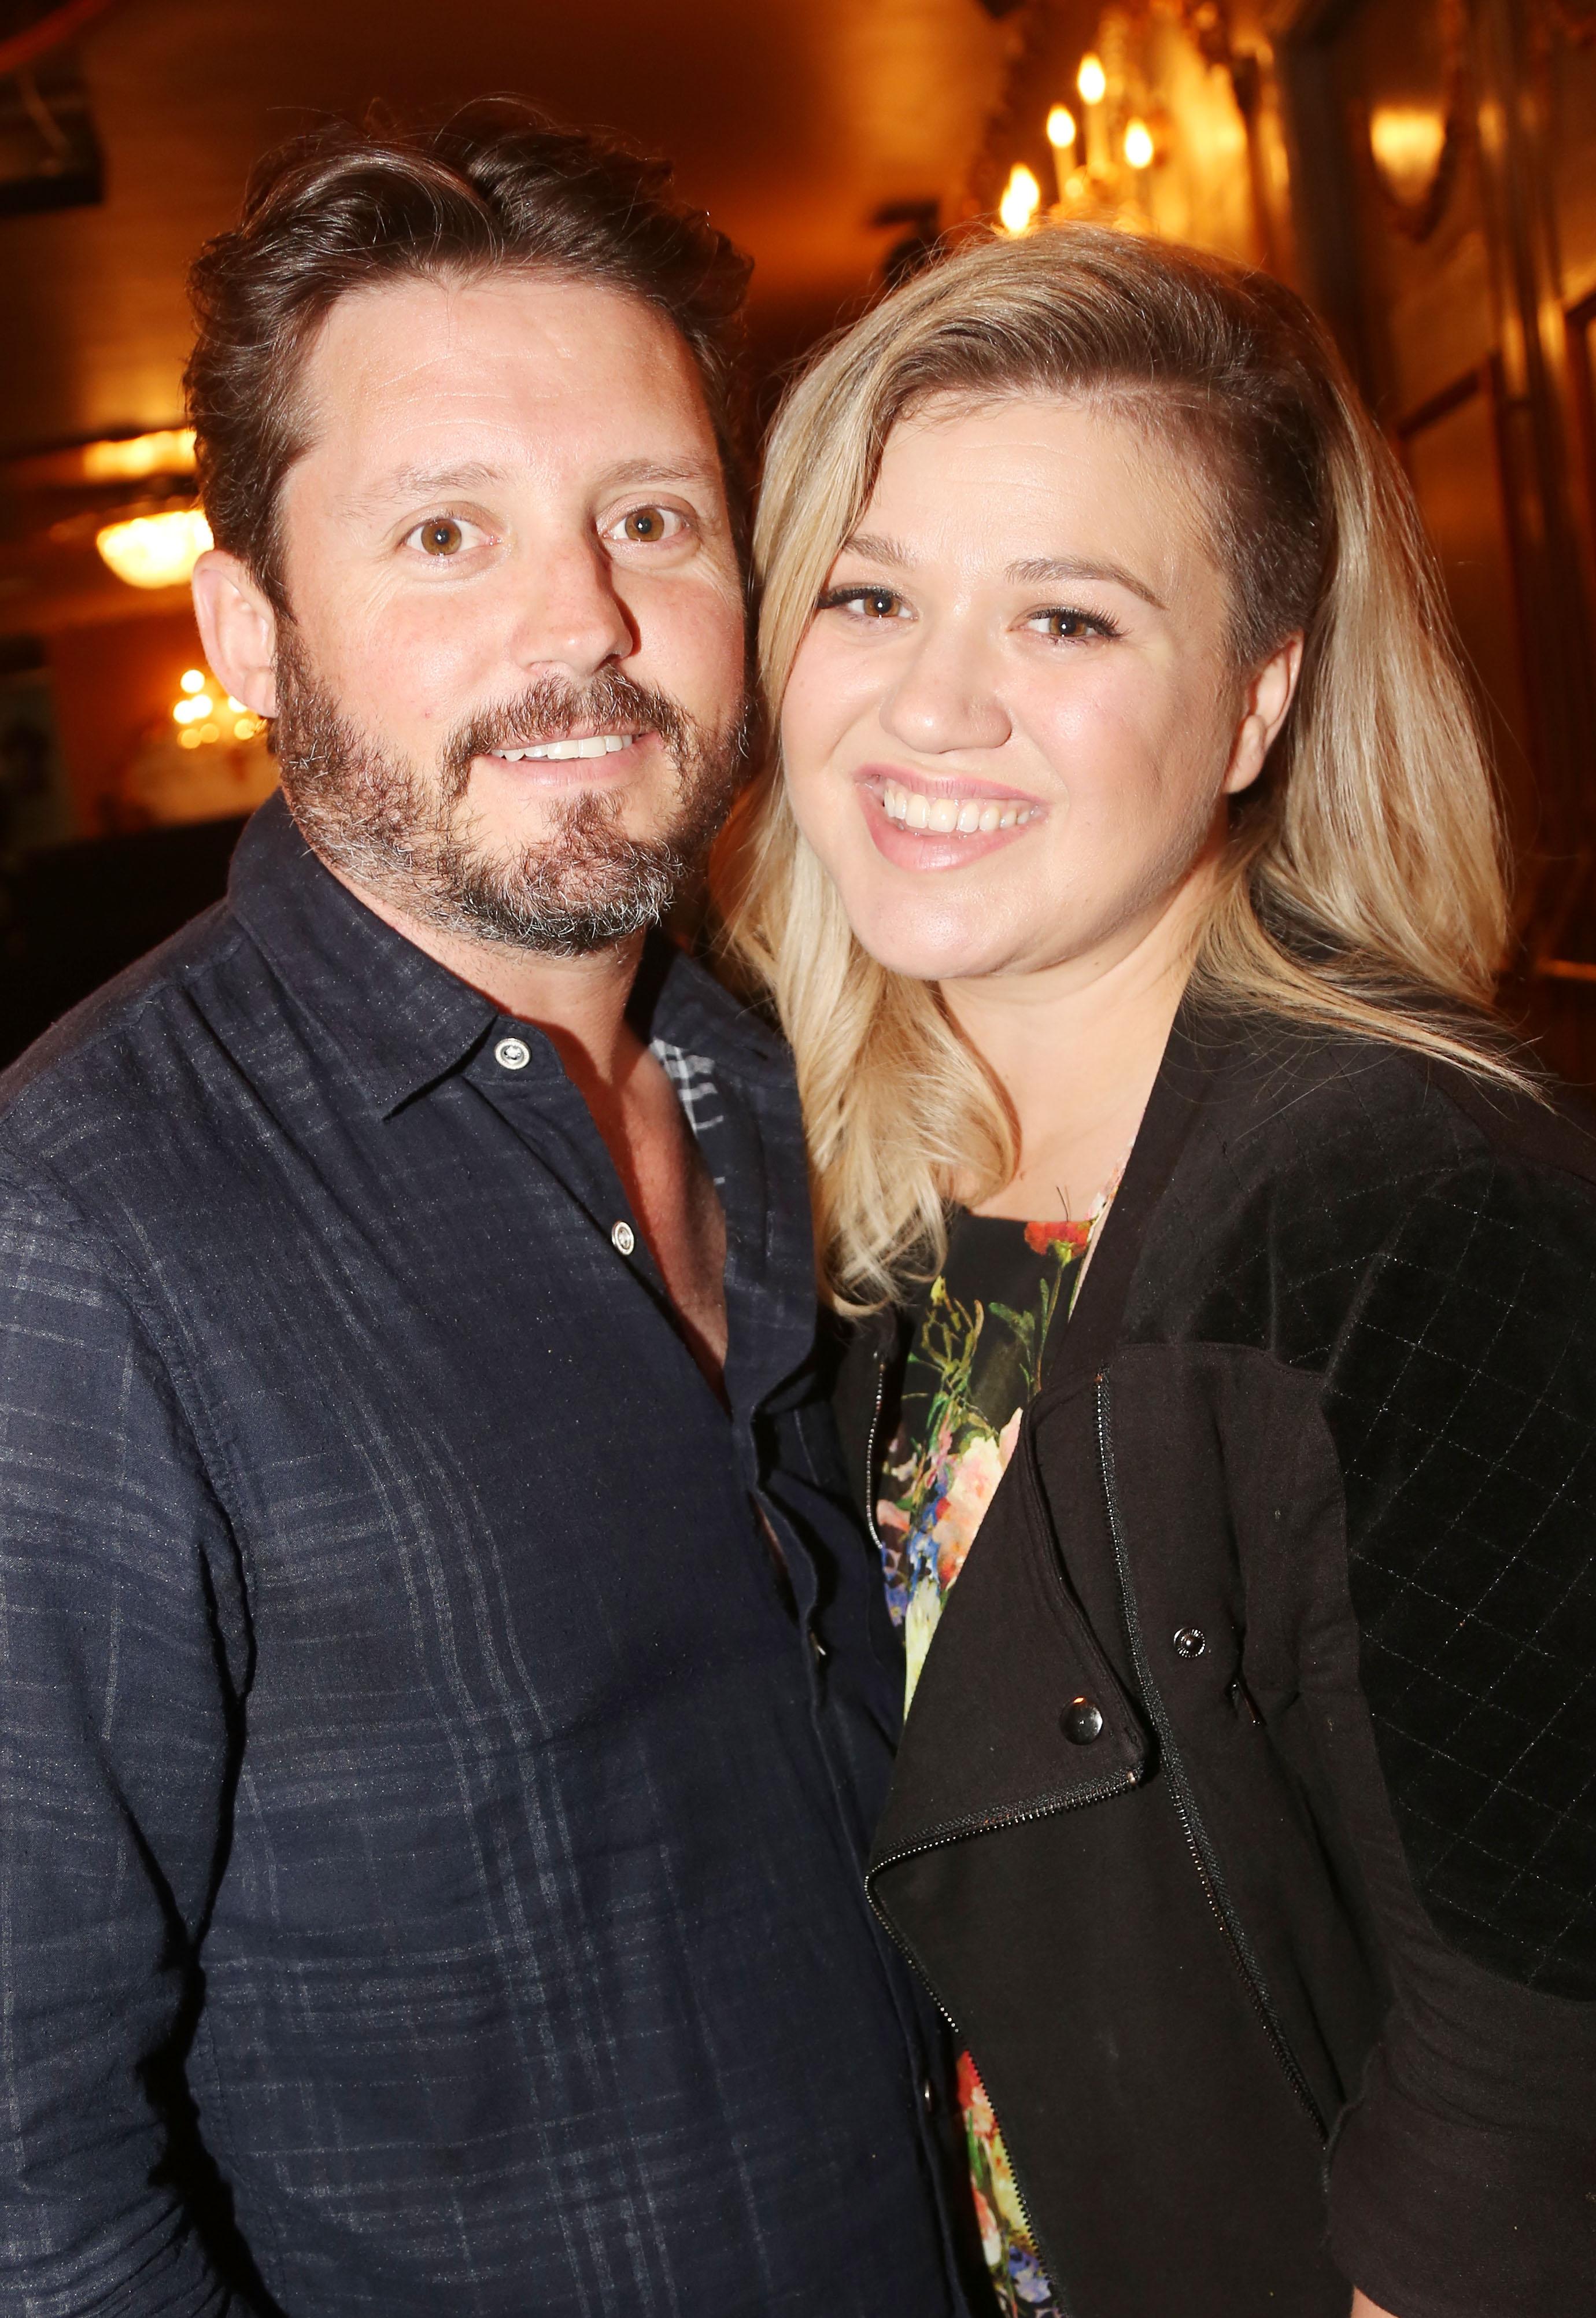 Kelly Clarkson and Brandon Blackstock in 2015.